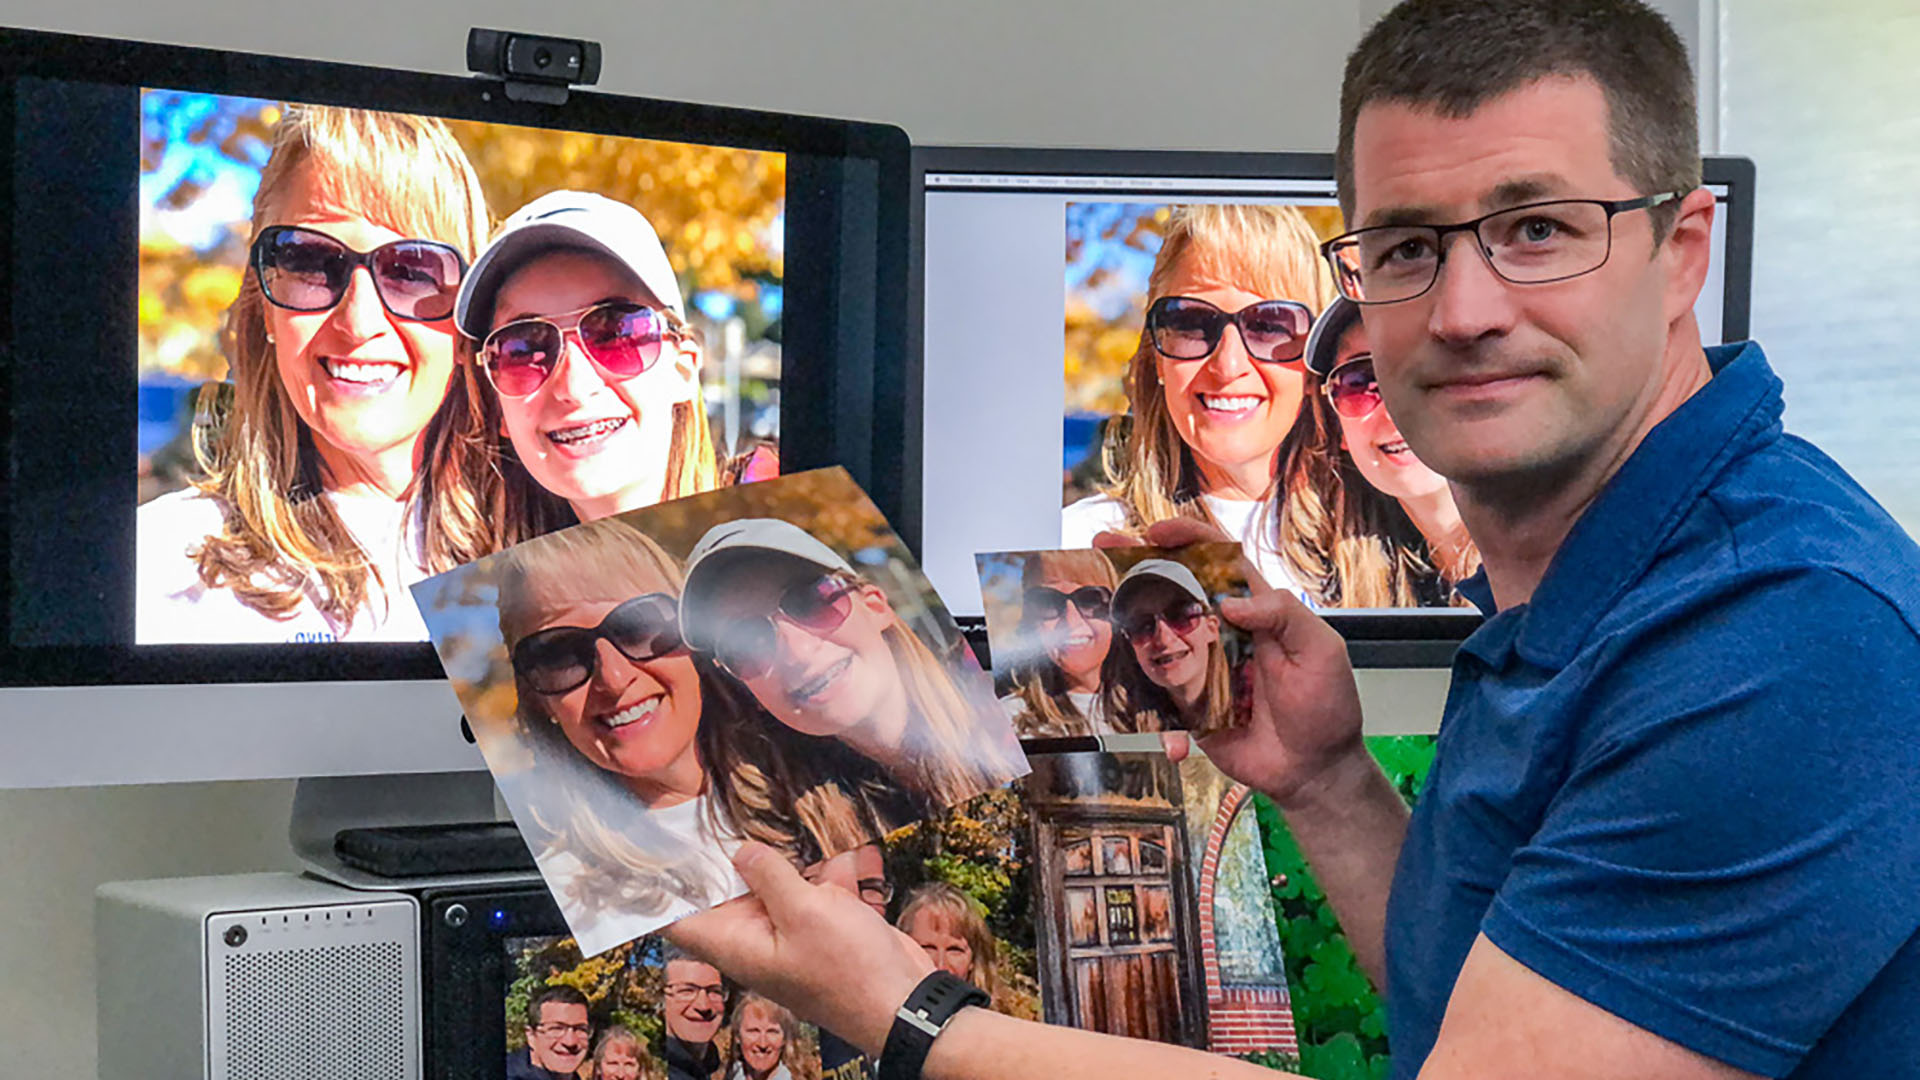 Five keys to printing cell phone photographs | Photofocus